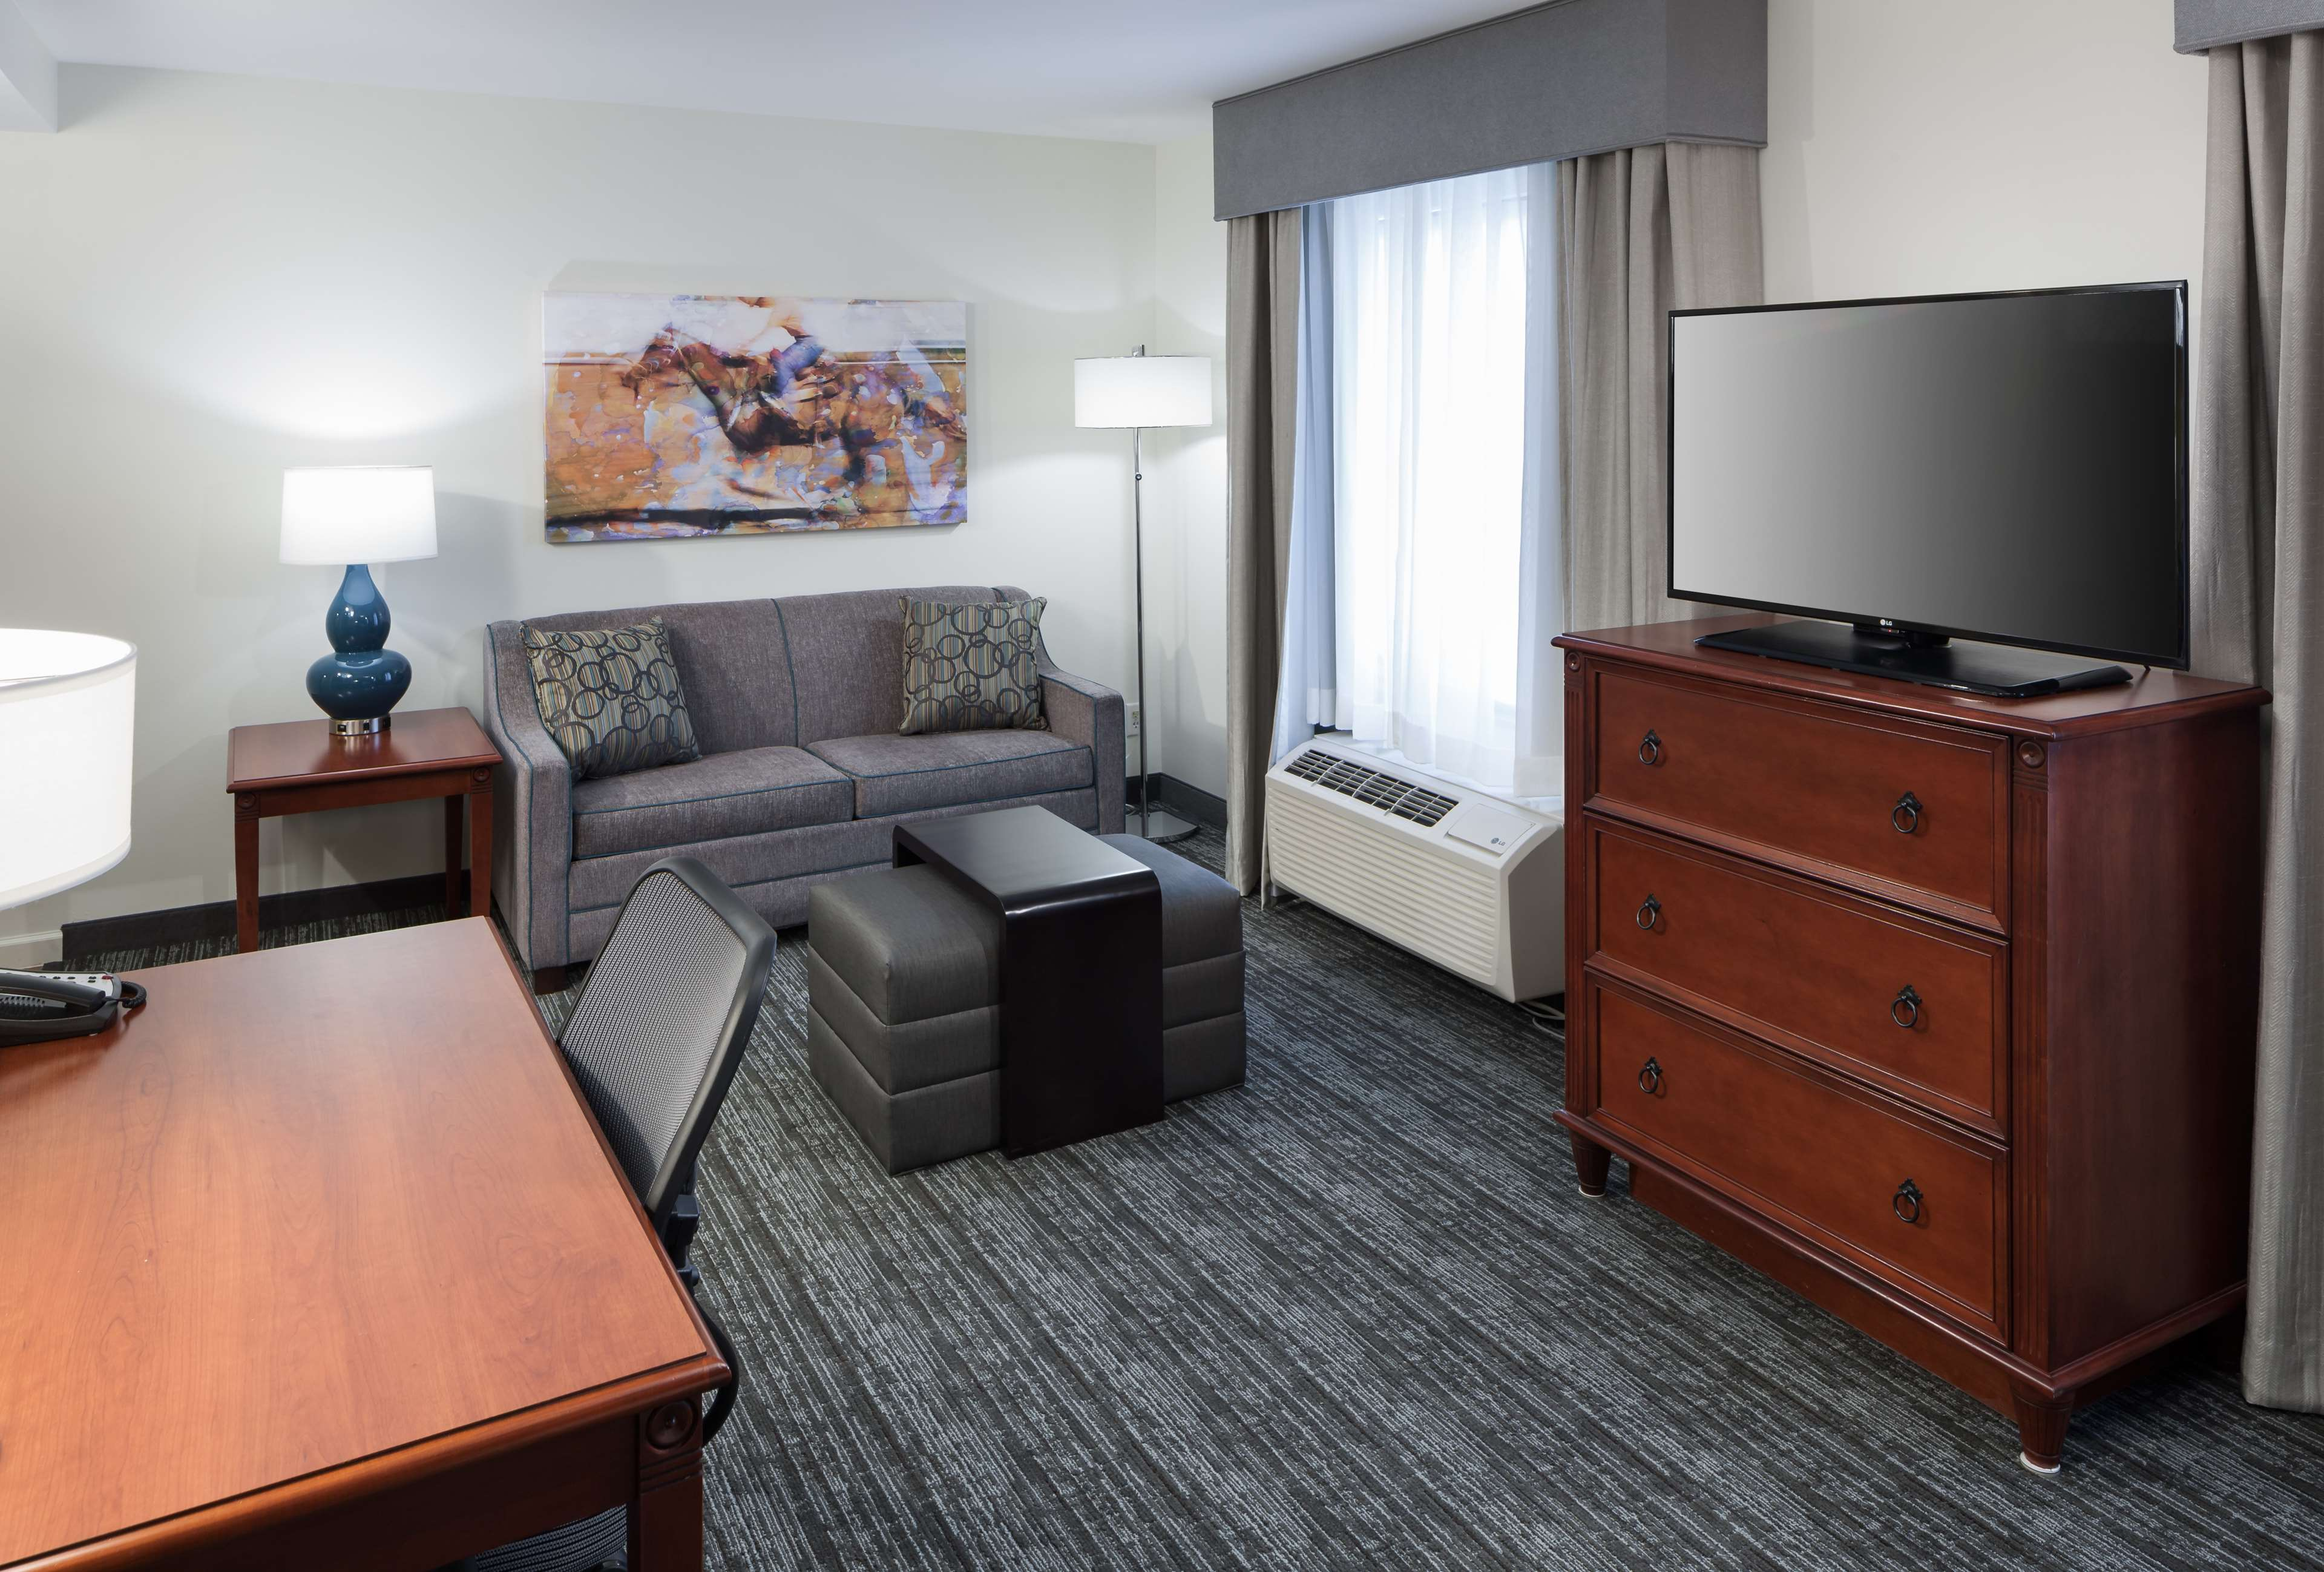 Homewood Suites by Hilton Denton image 15